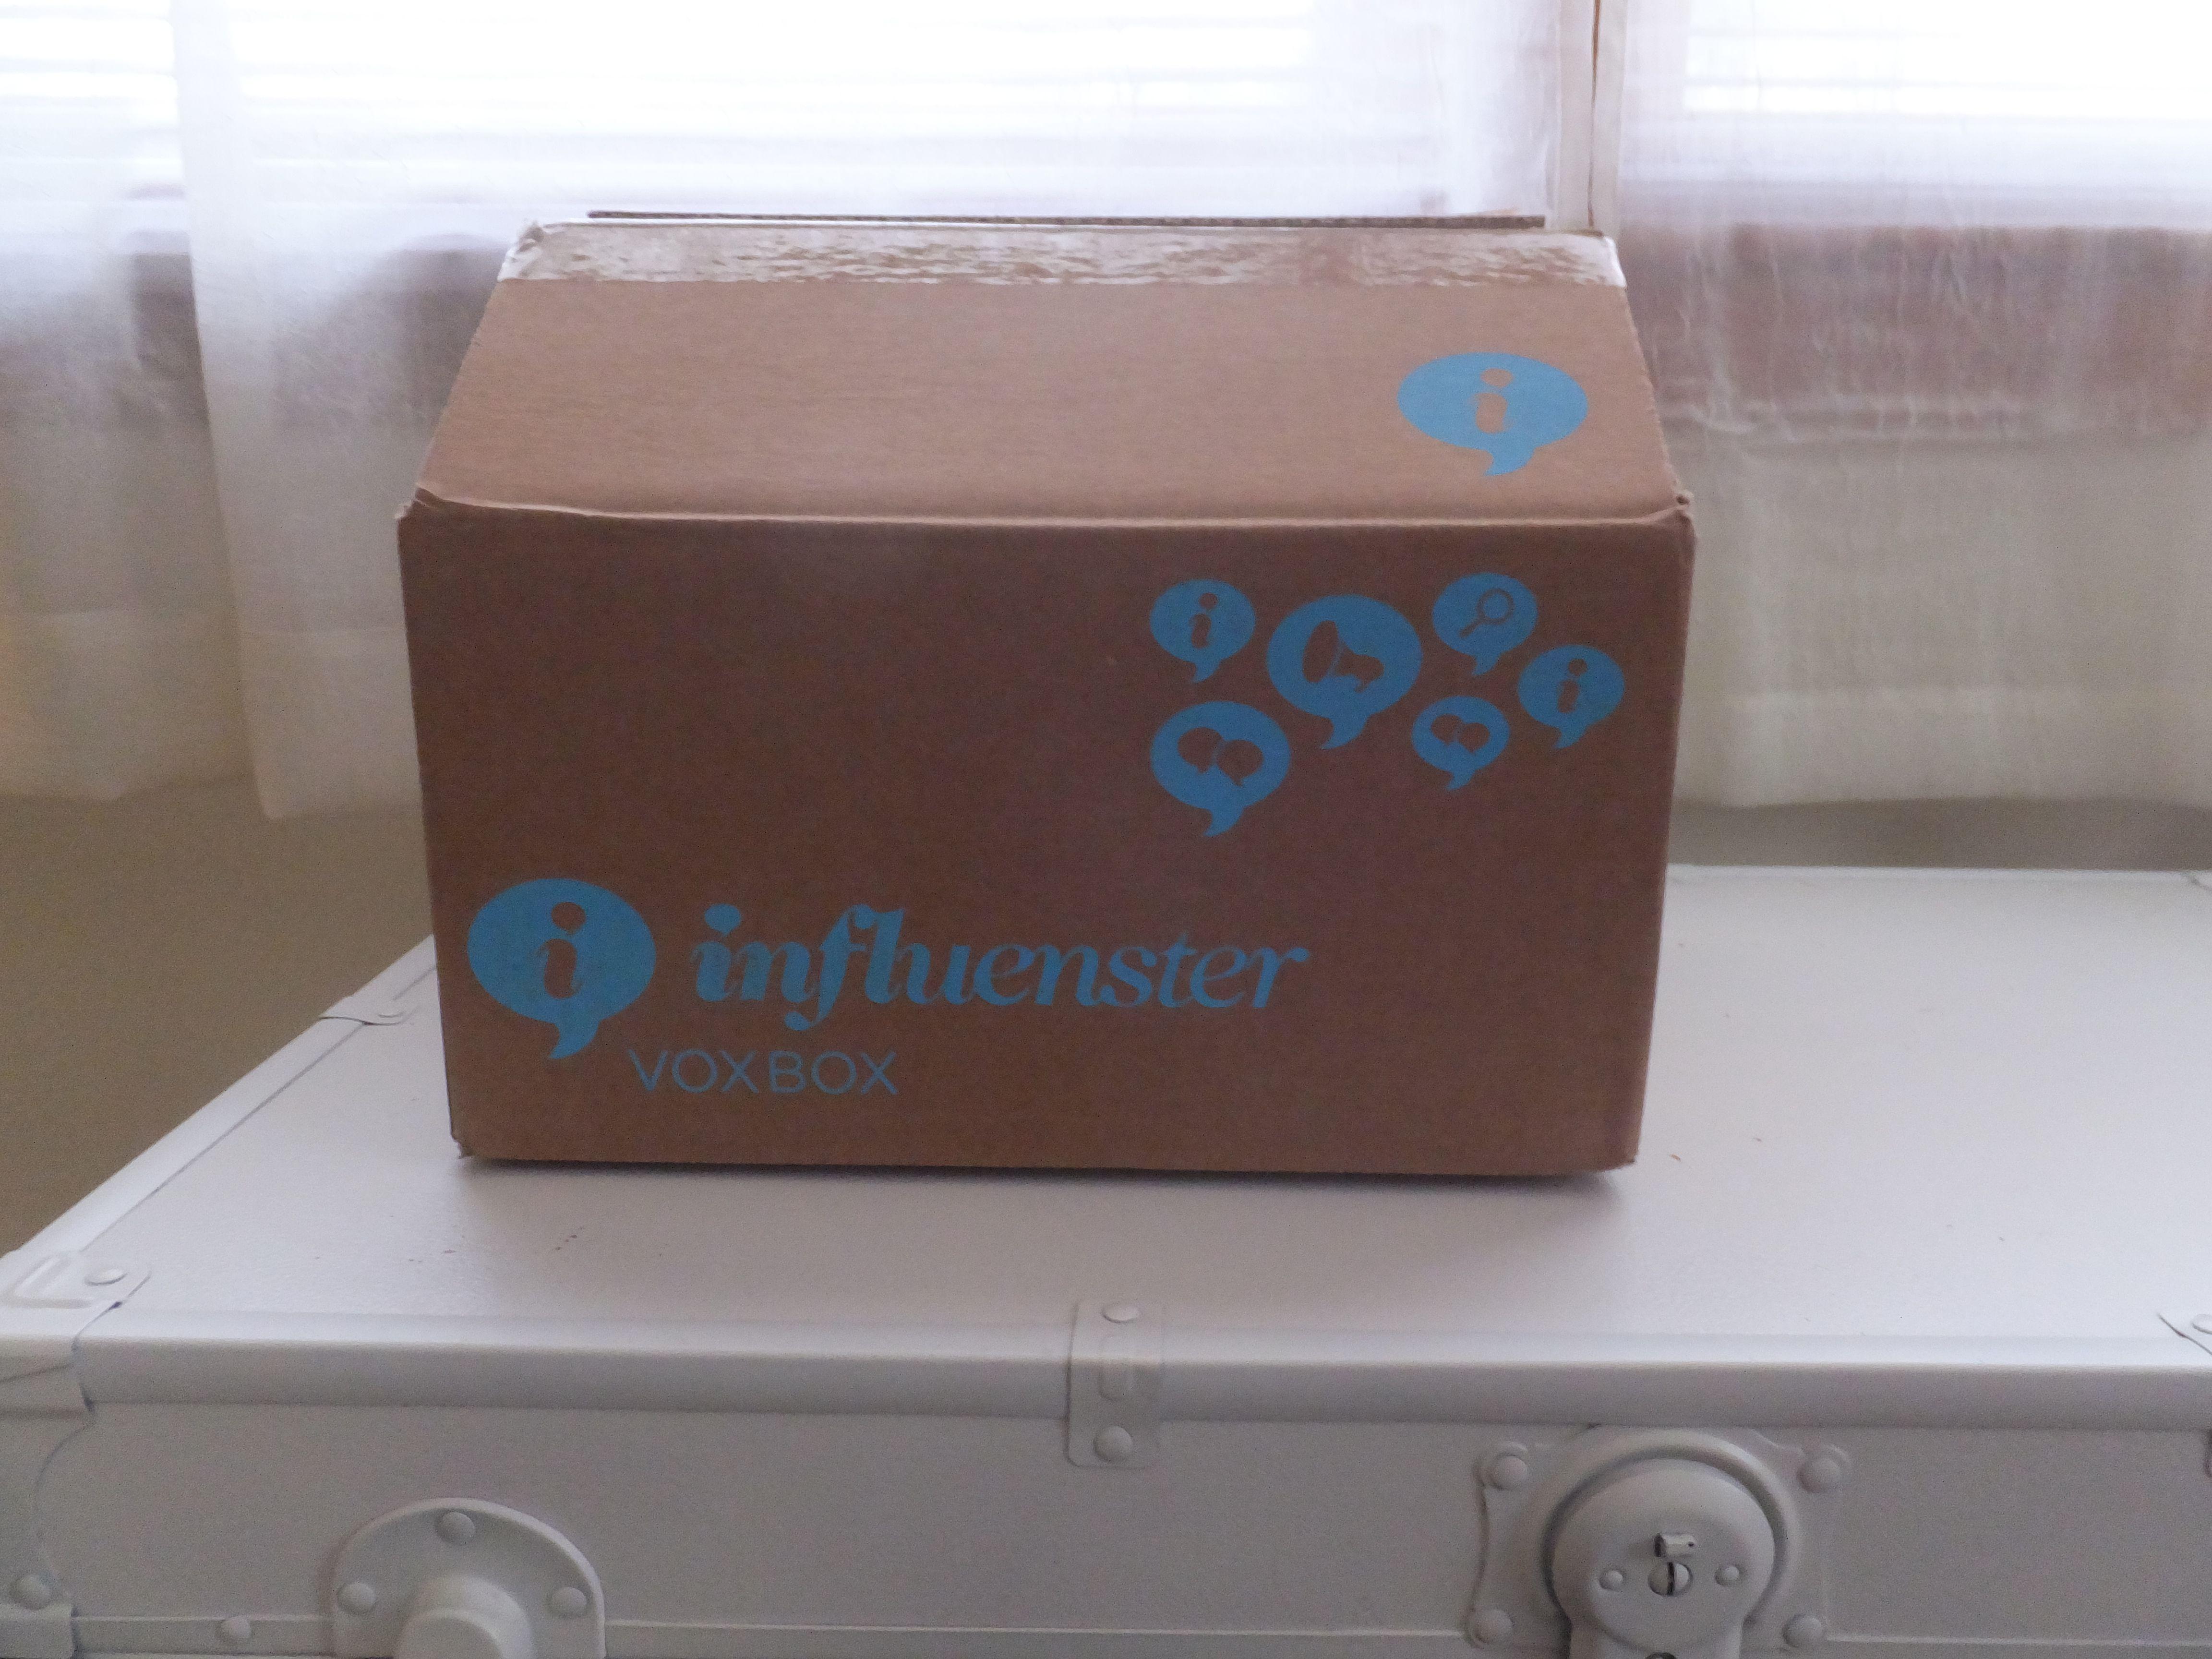 My #GoVoxBox has arrived!